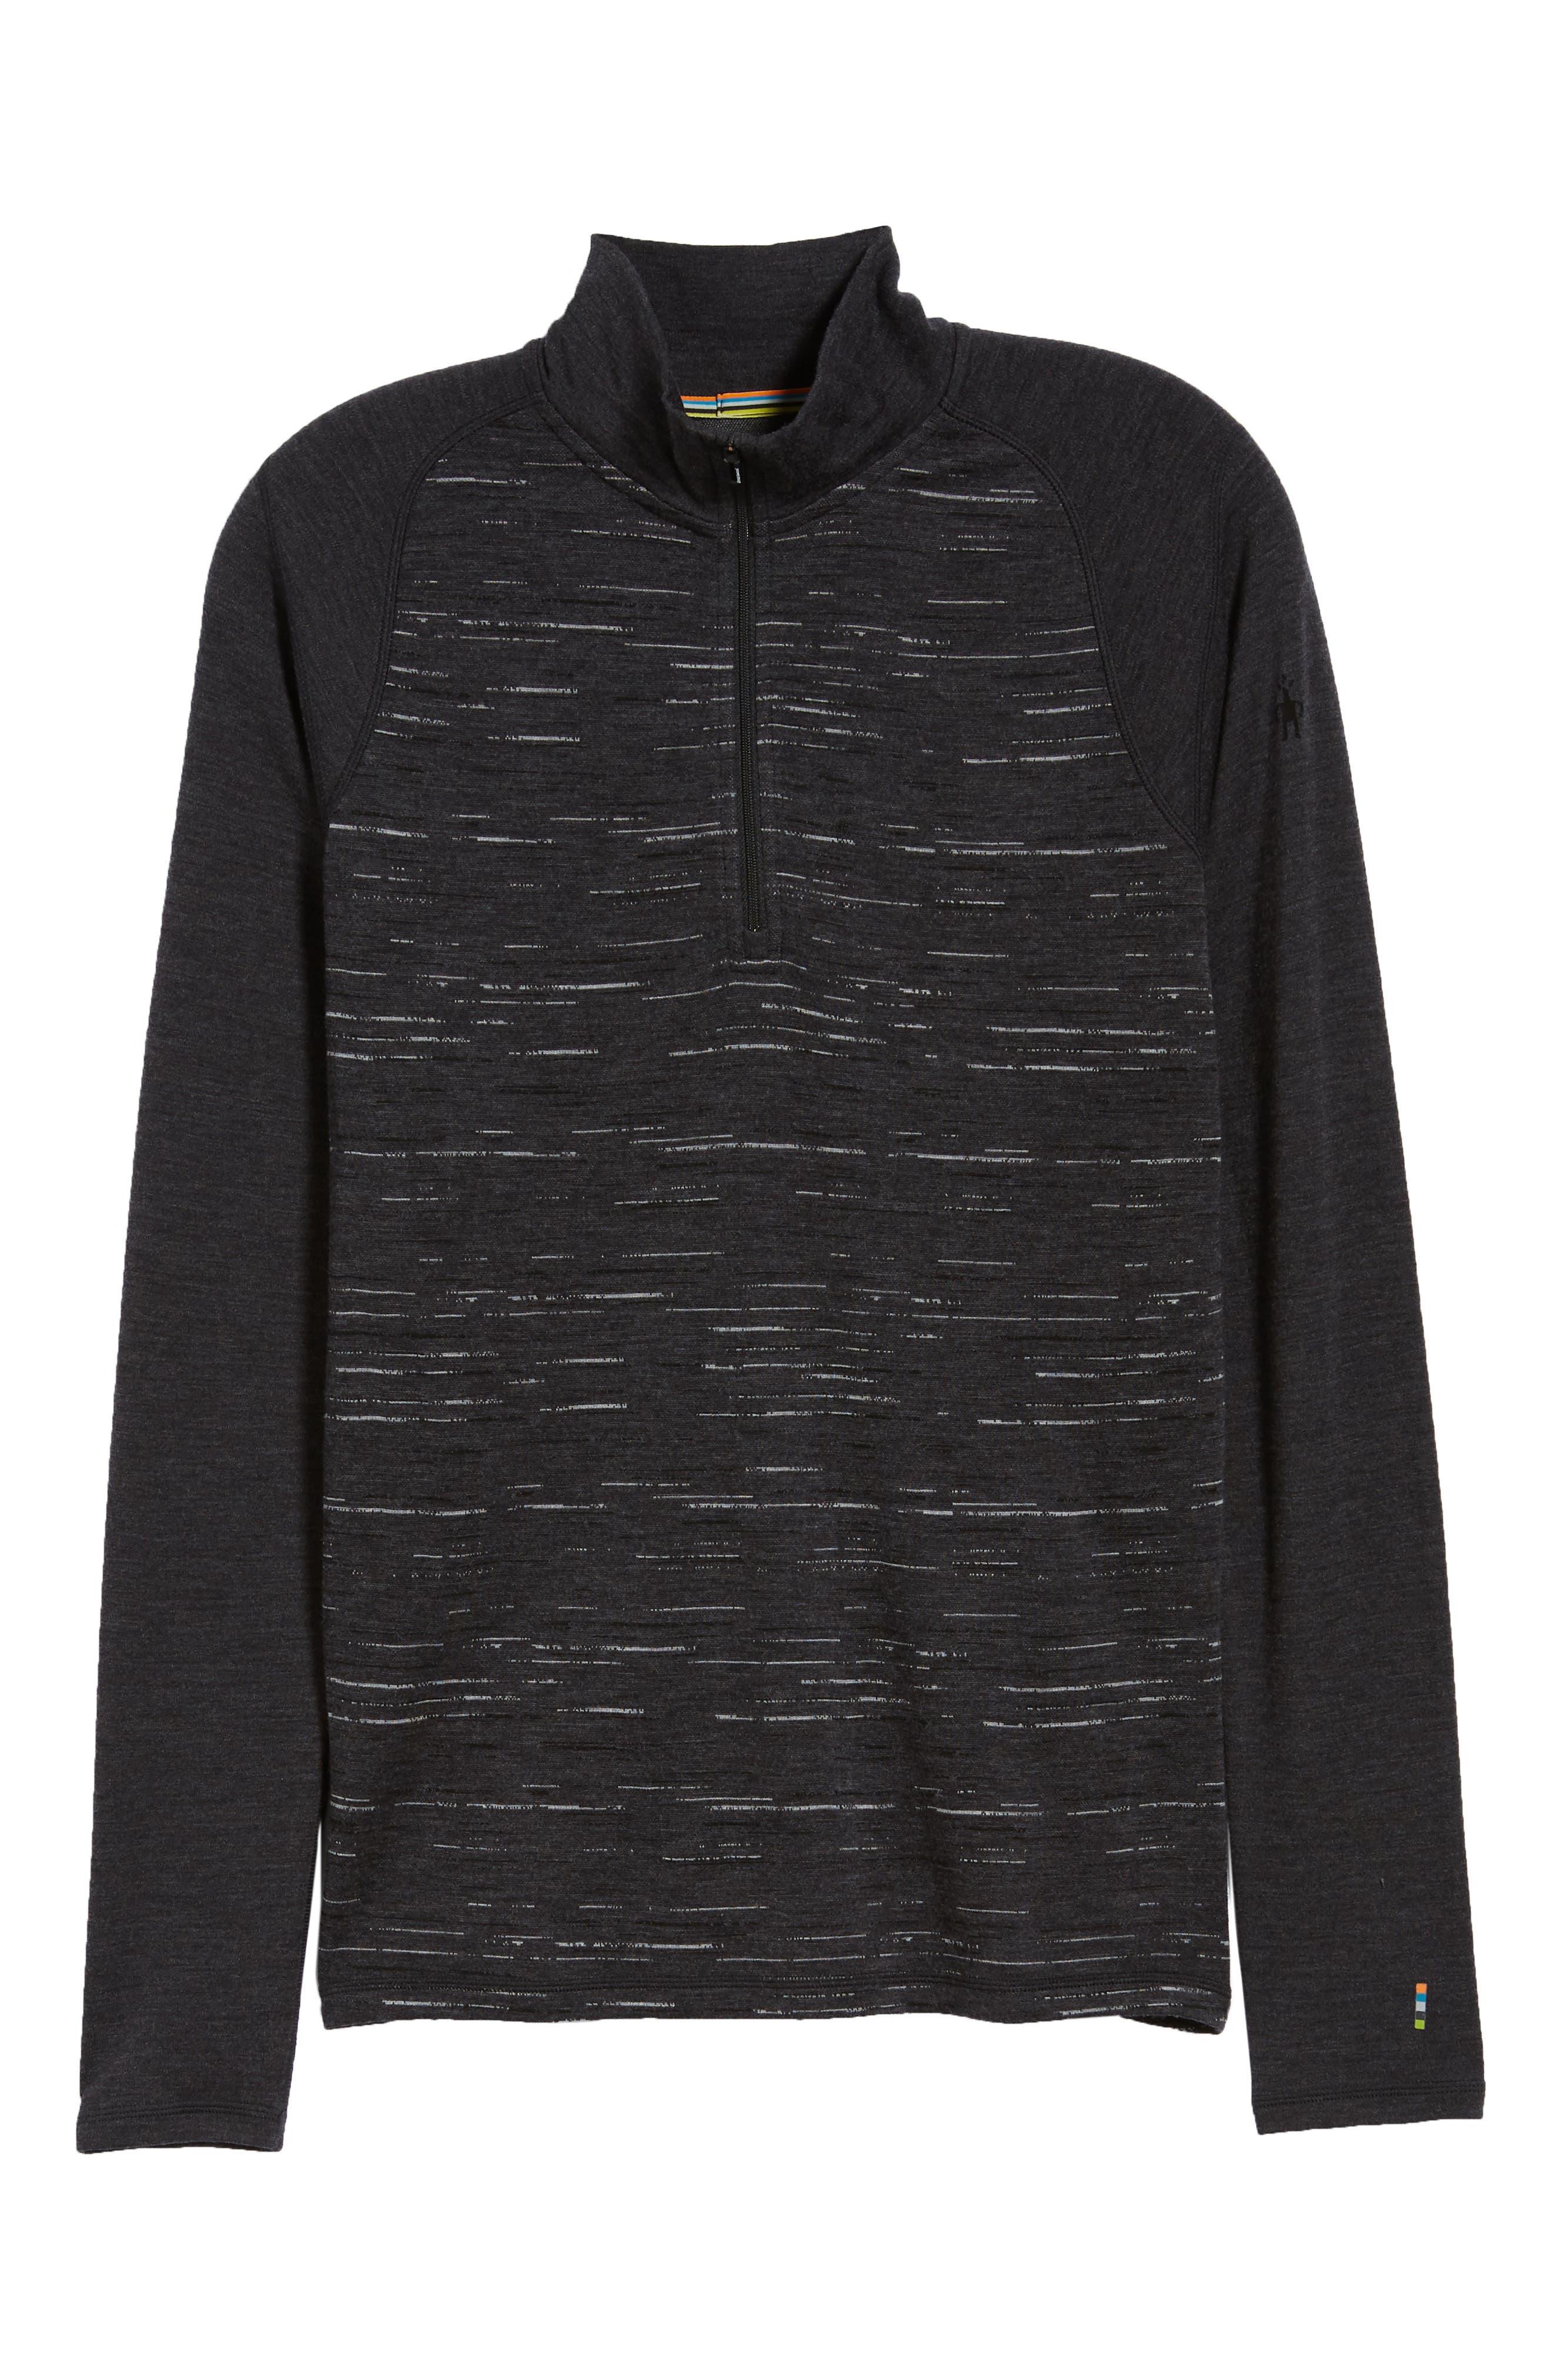 SMARTWOOL,                             Merino 250 Base Layer Pattern Quarter Zip Pullover,                             Alternate thumbnail 6, color,                             CHARCOAL/ BLACK